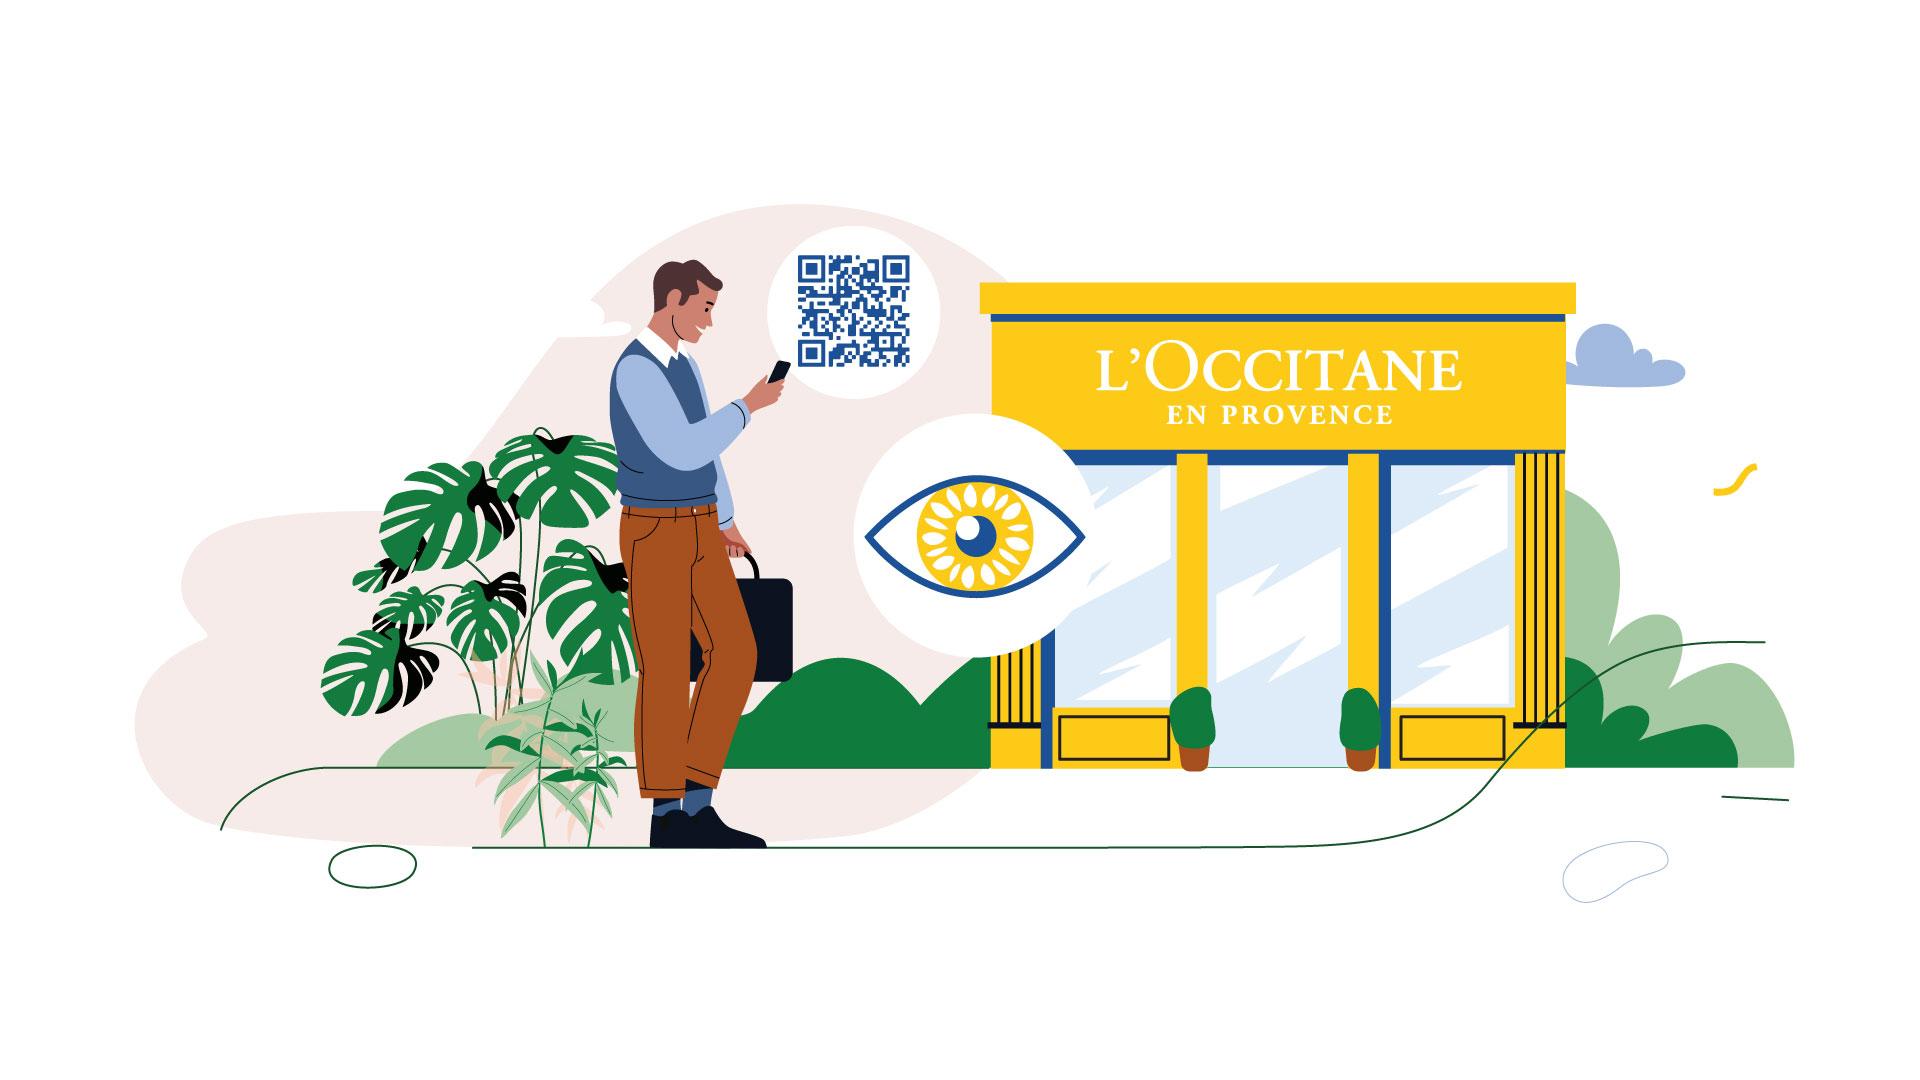 L'Occitane - Race for Vision